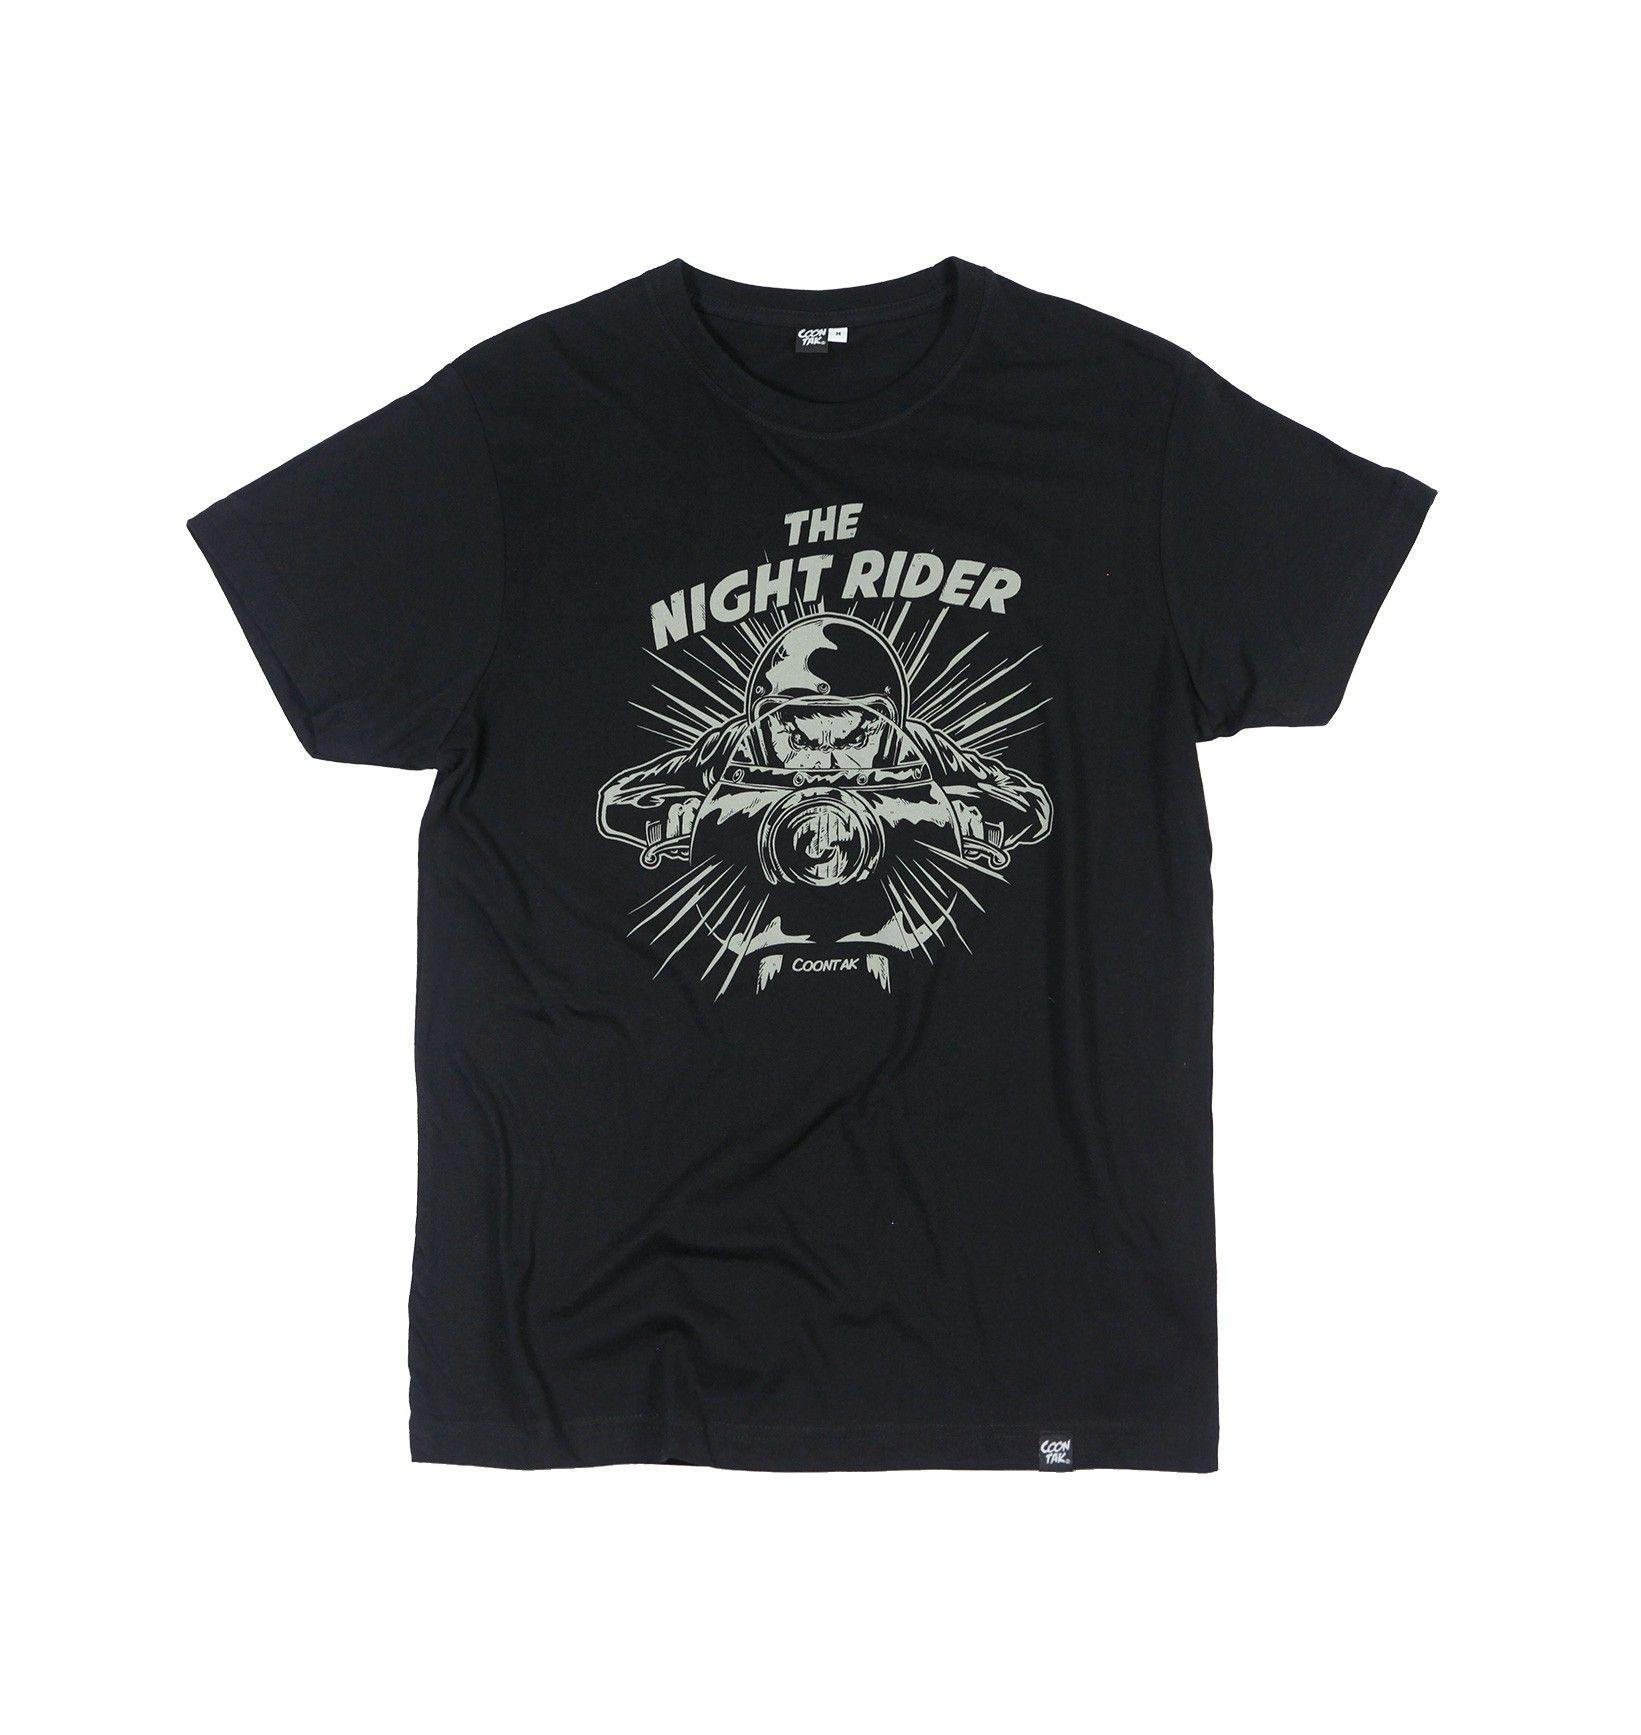 T-shirt Night Rider by COONTAK | Shop on: https://grafitee.us/s/t-shirts/935-t-shirt-night-rider.html | #tshirt #fashion #clothing #apparel #grafitee #shopindie